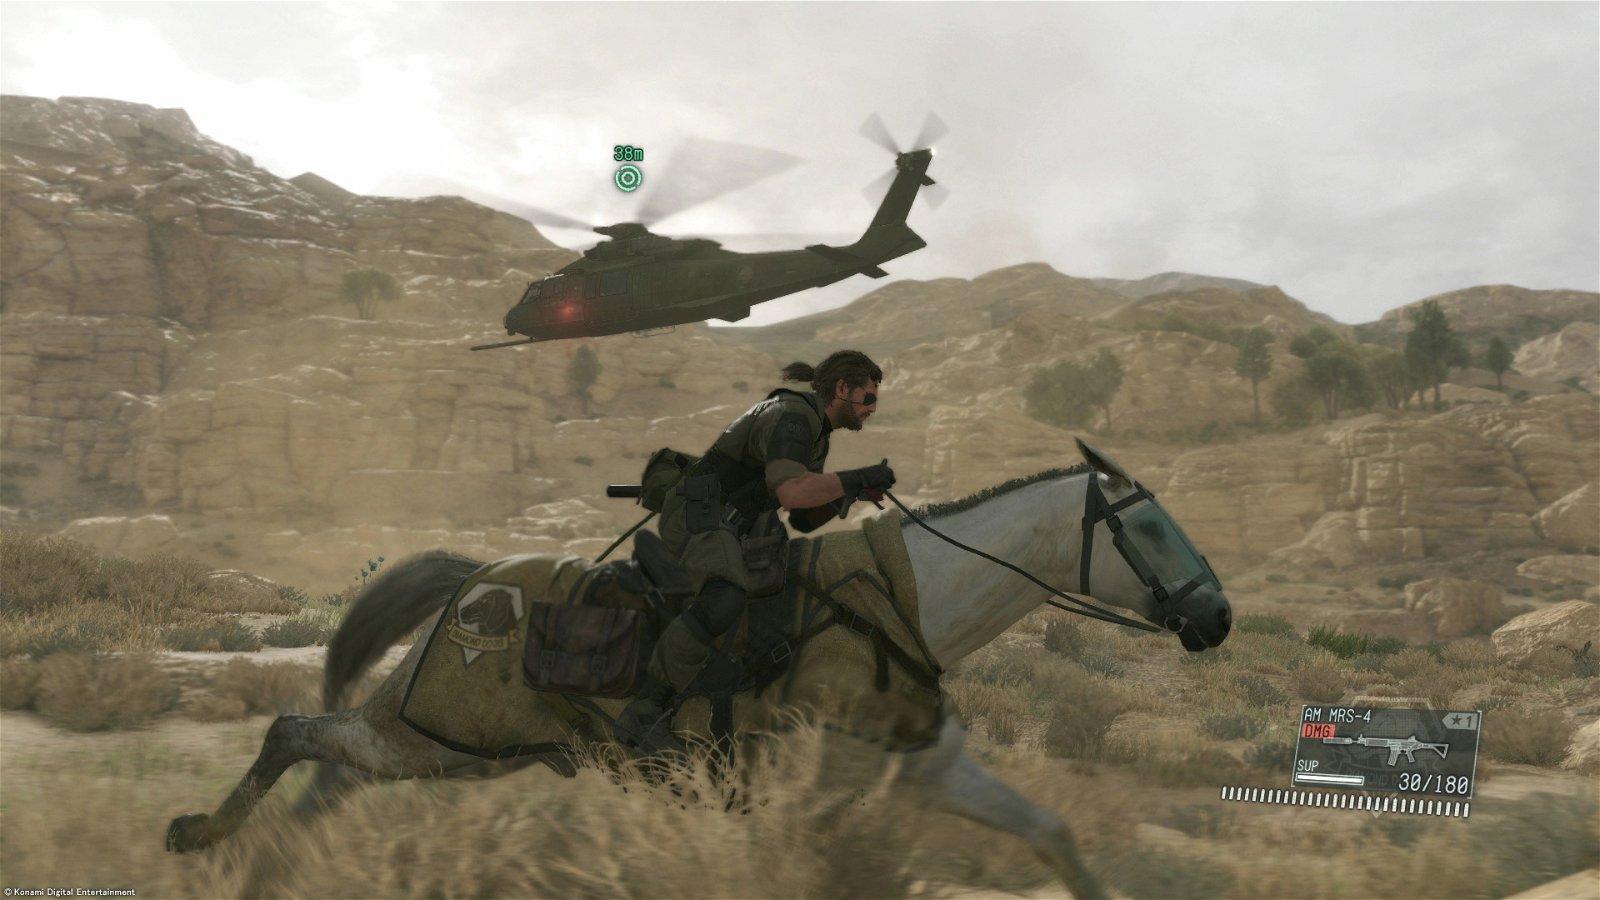 Metal Gear Solid V: The Phantom Pain Preview: Secretive Brilliance 1